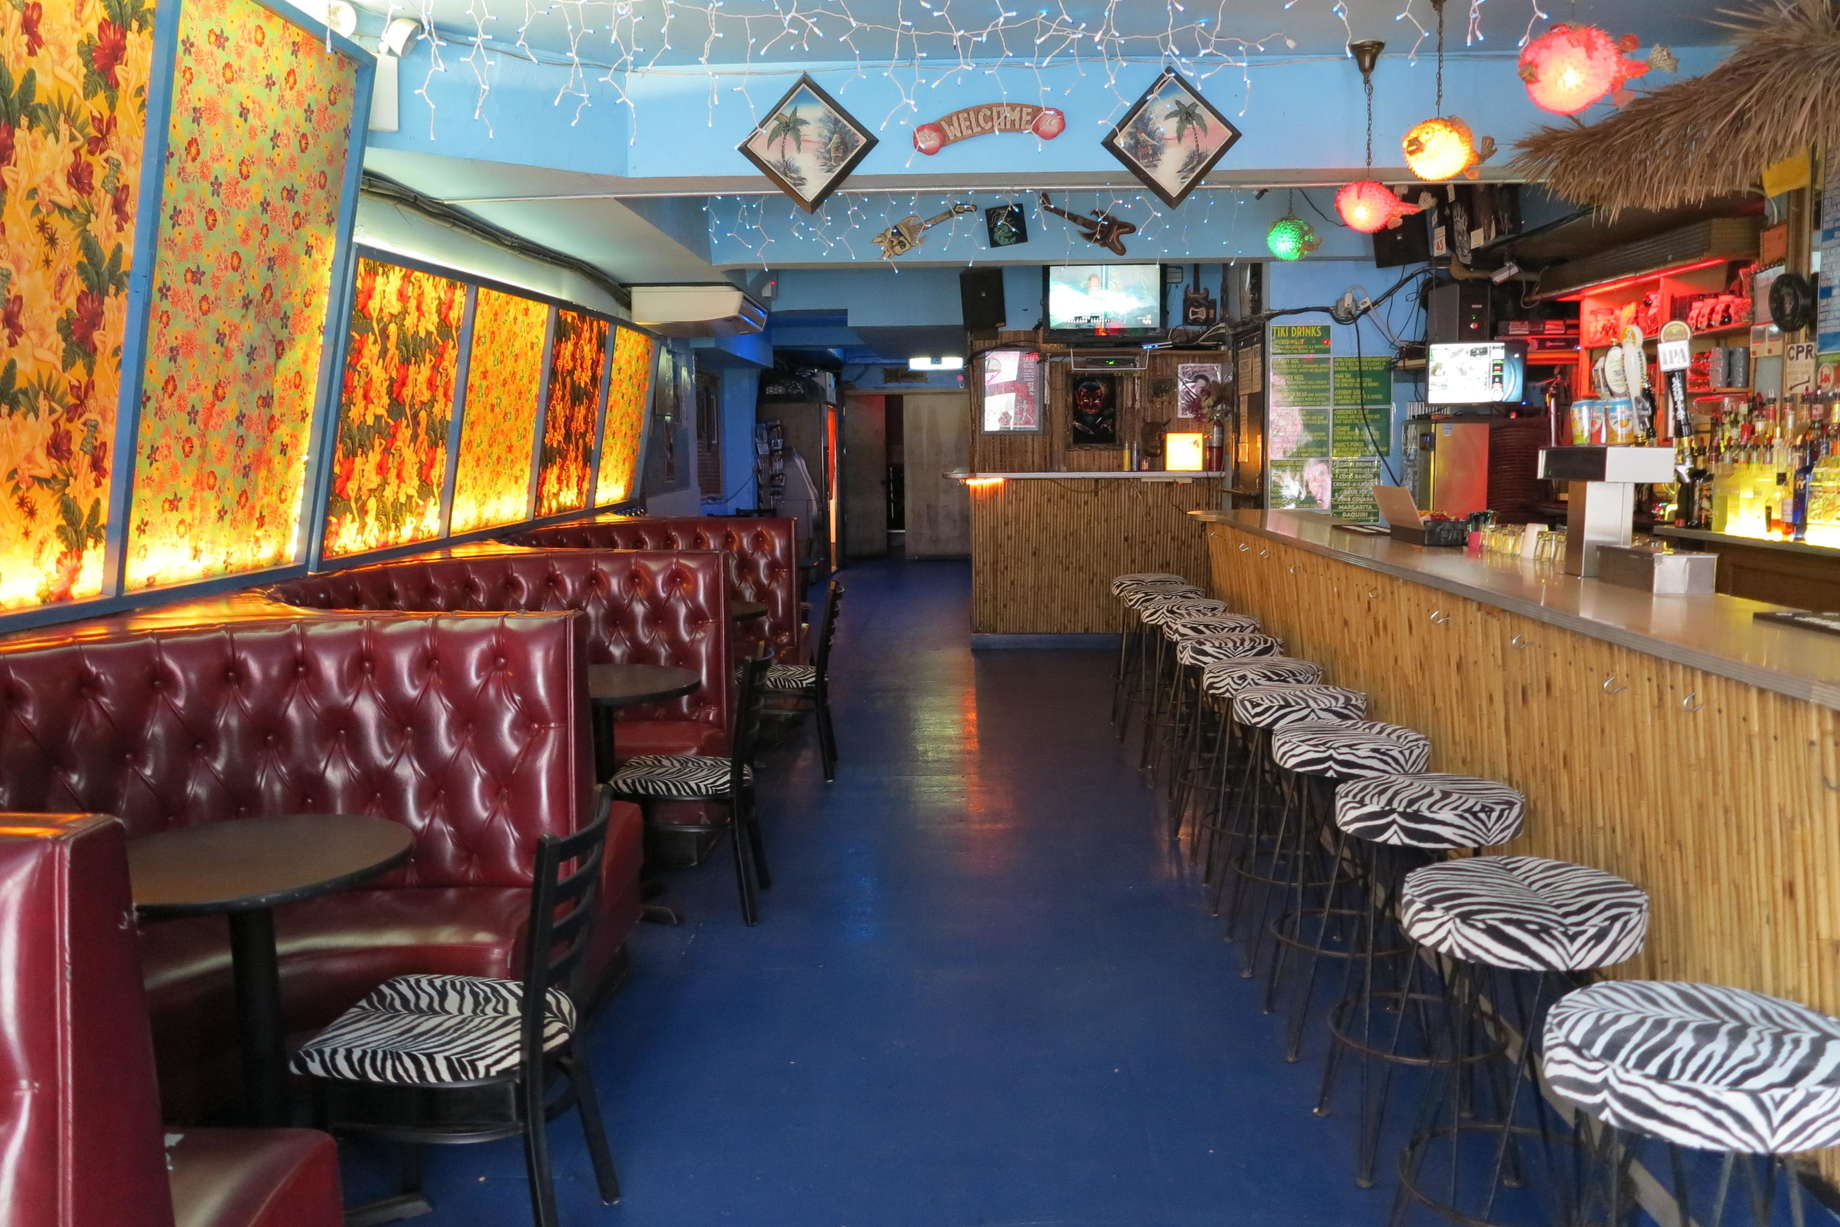 The 31 Greatest Bar Names in America - Featuring Jon Taffer